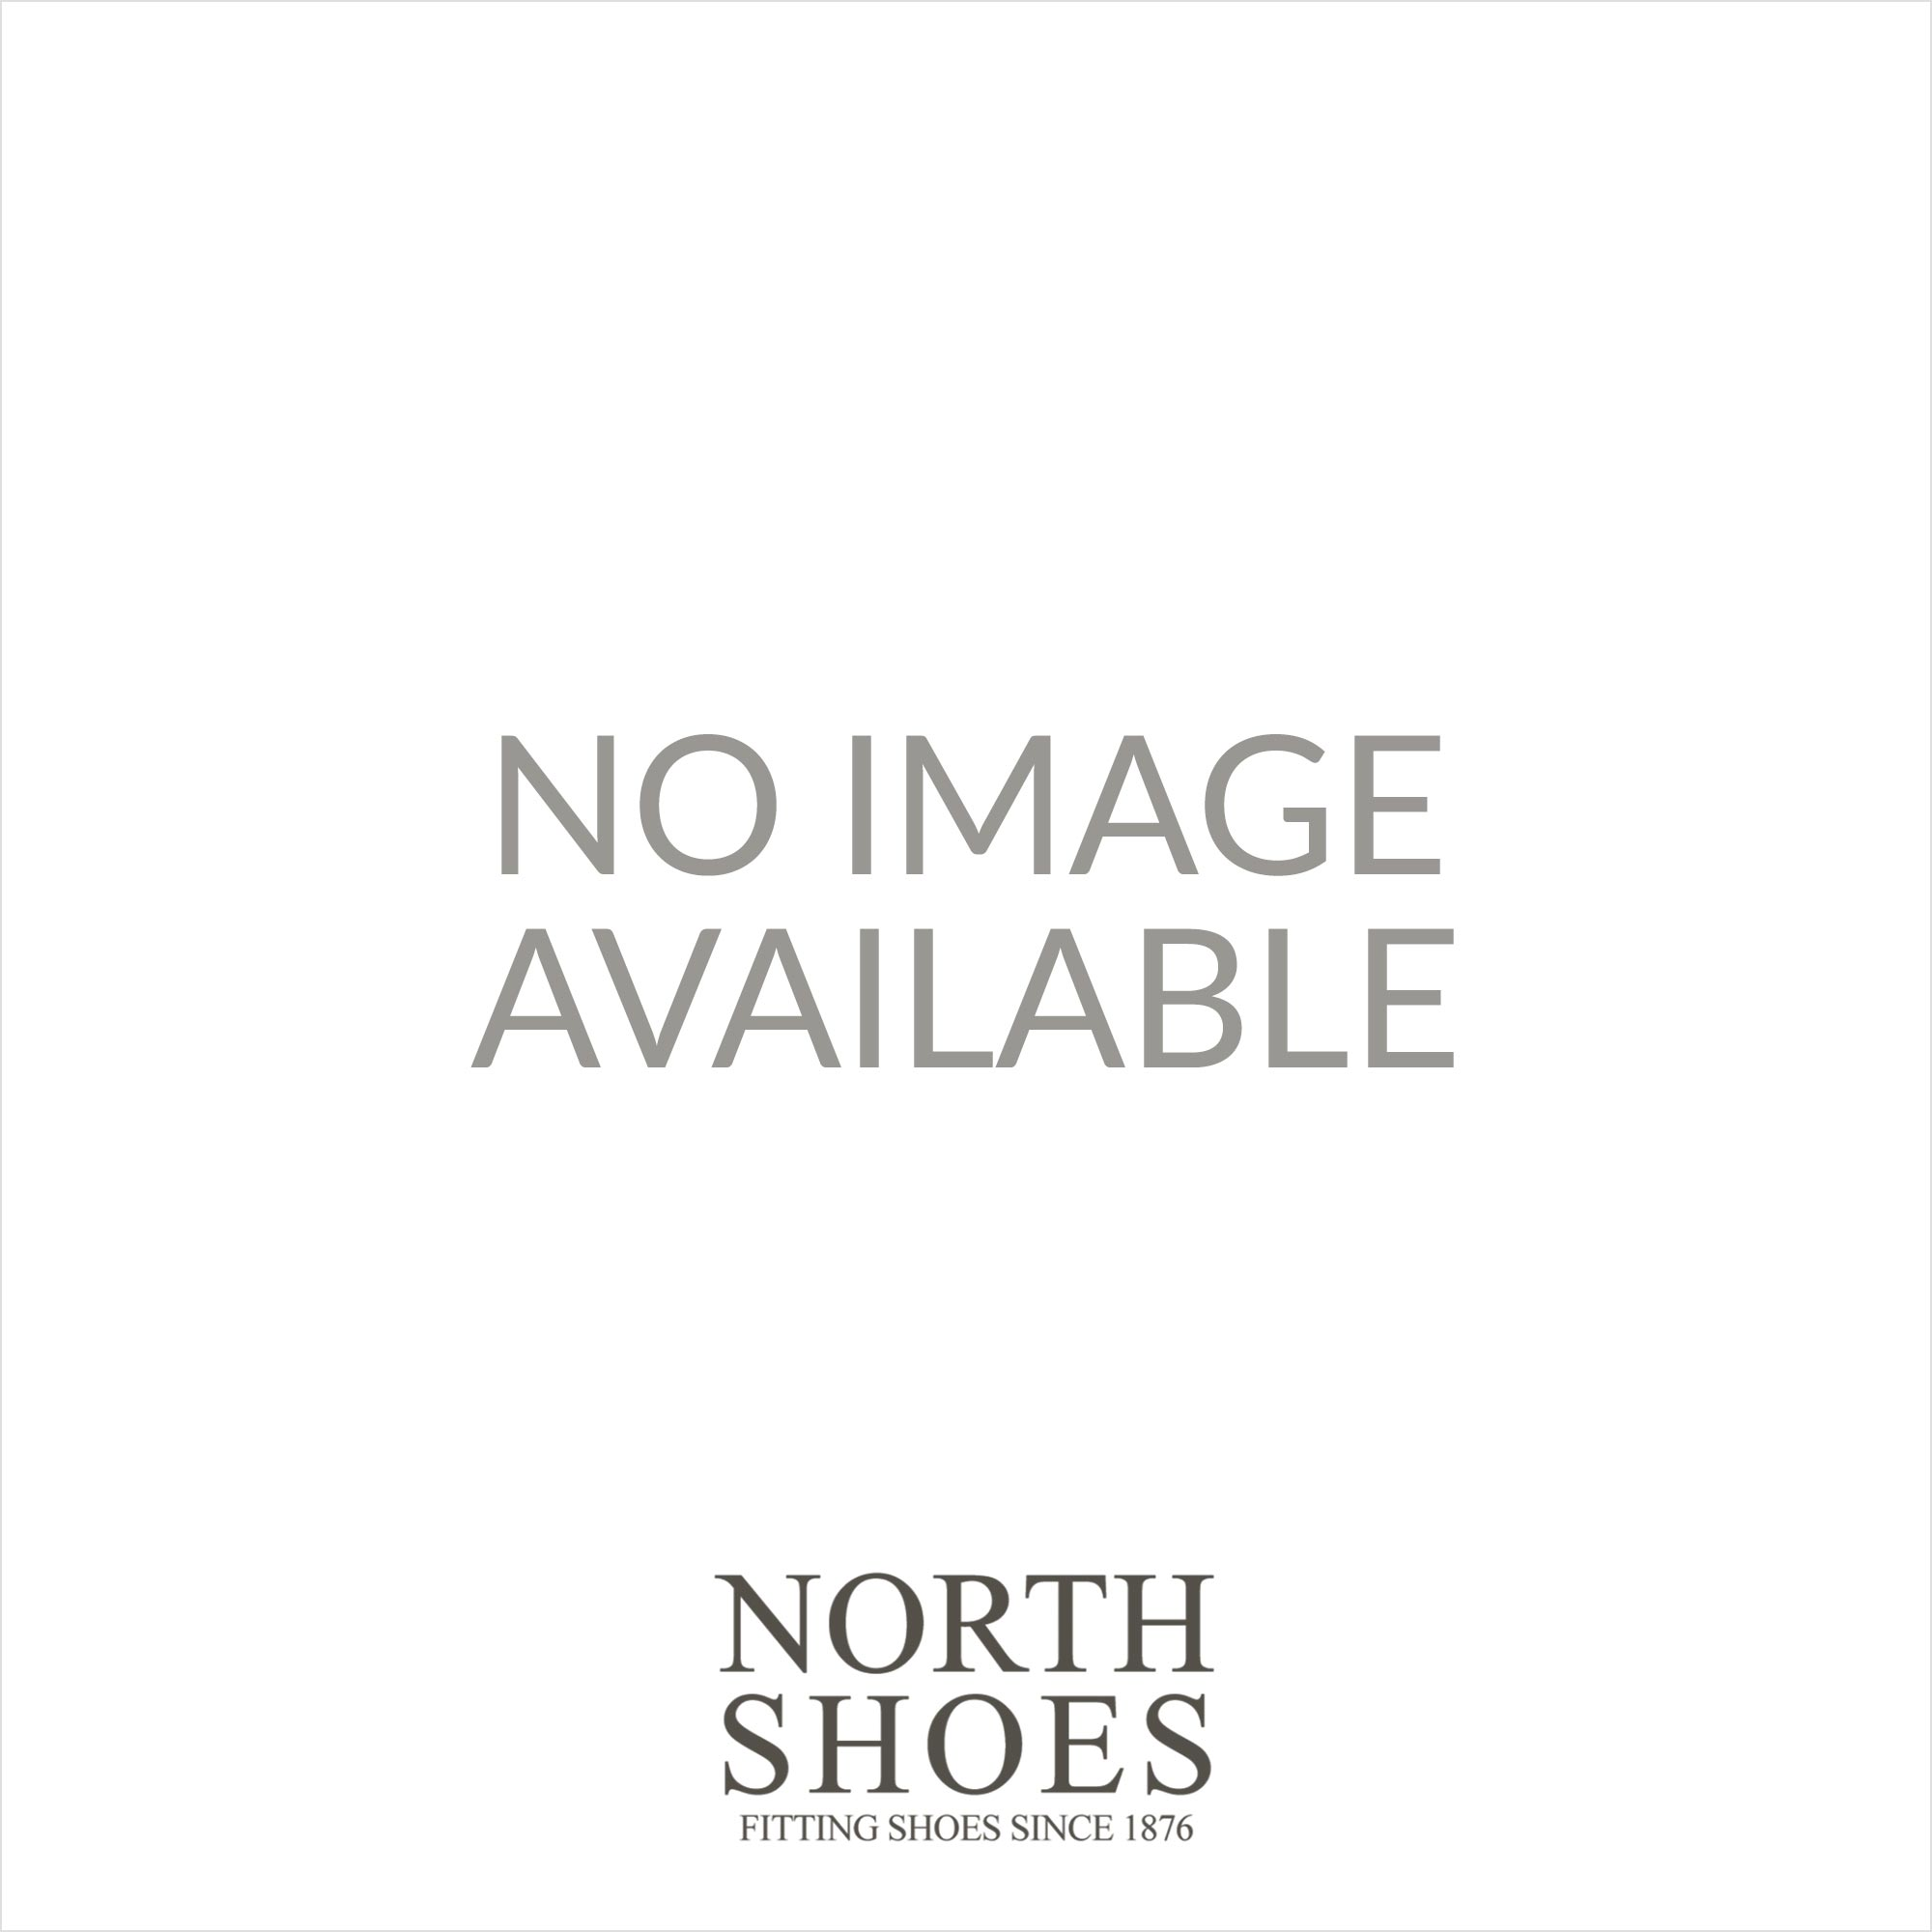 VA34AAF8N Turquoise Girls Shoe